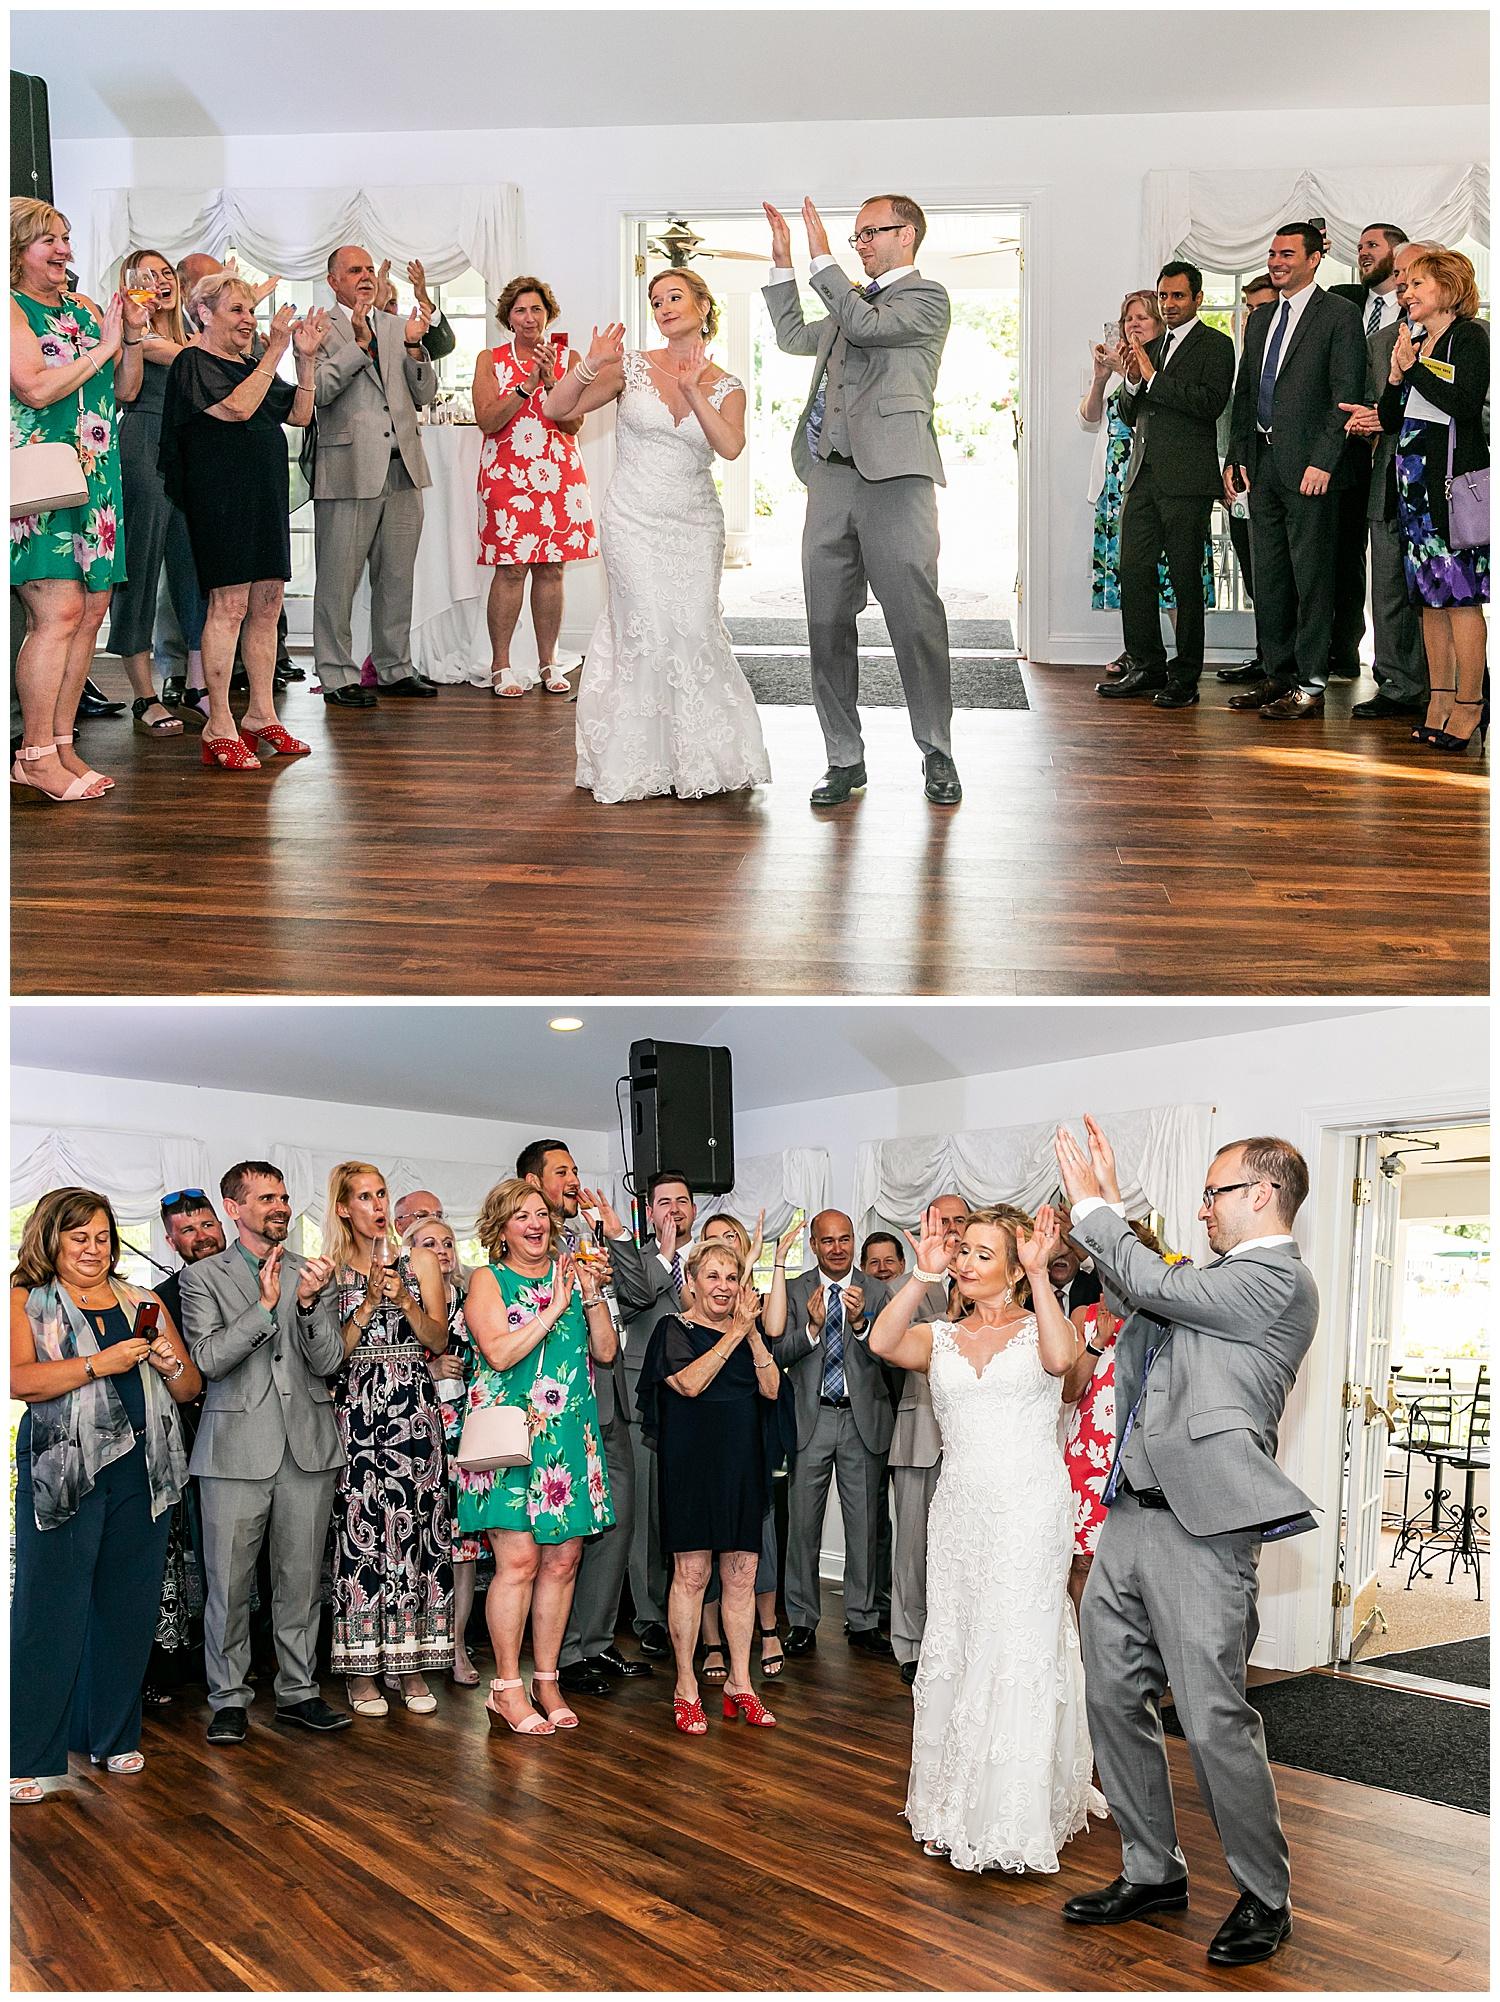 Michelle Shaun Antrim 1844 Wedding Living Radiant Photography photos_0161.jpg